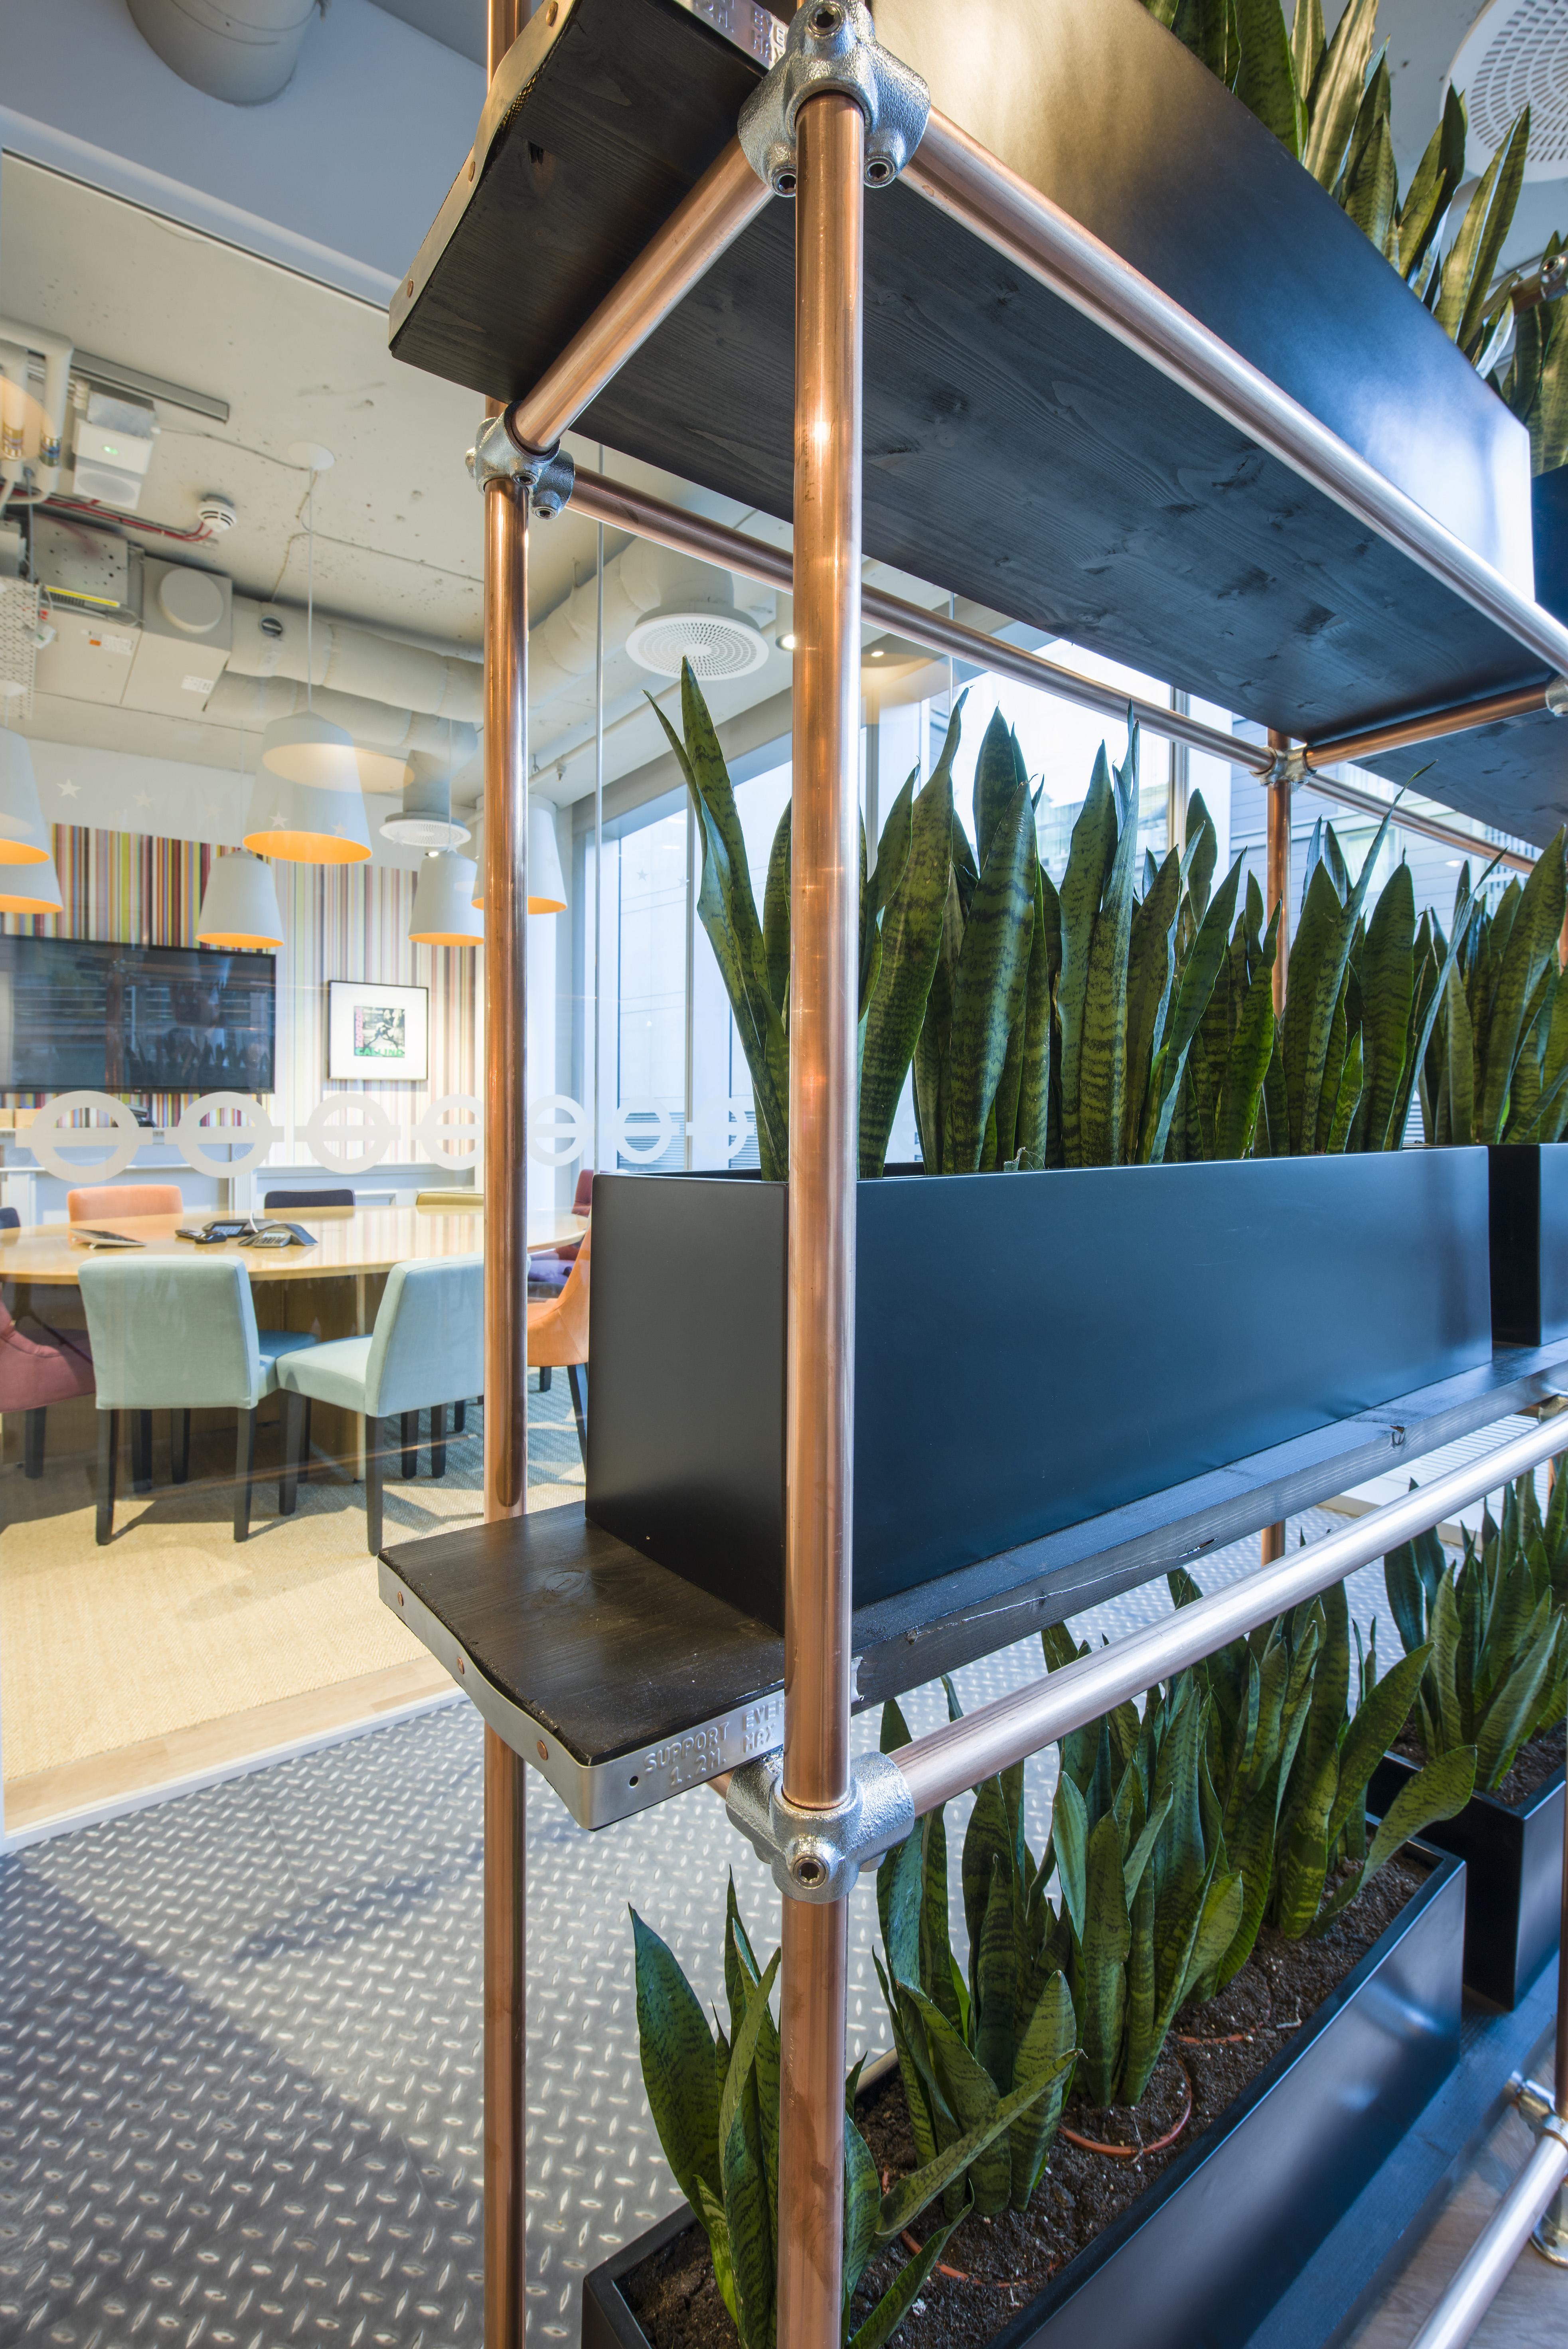 plants on shelves in office